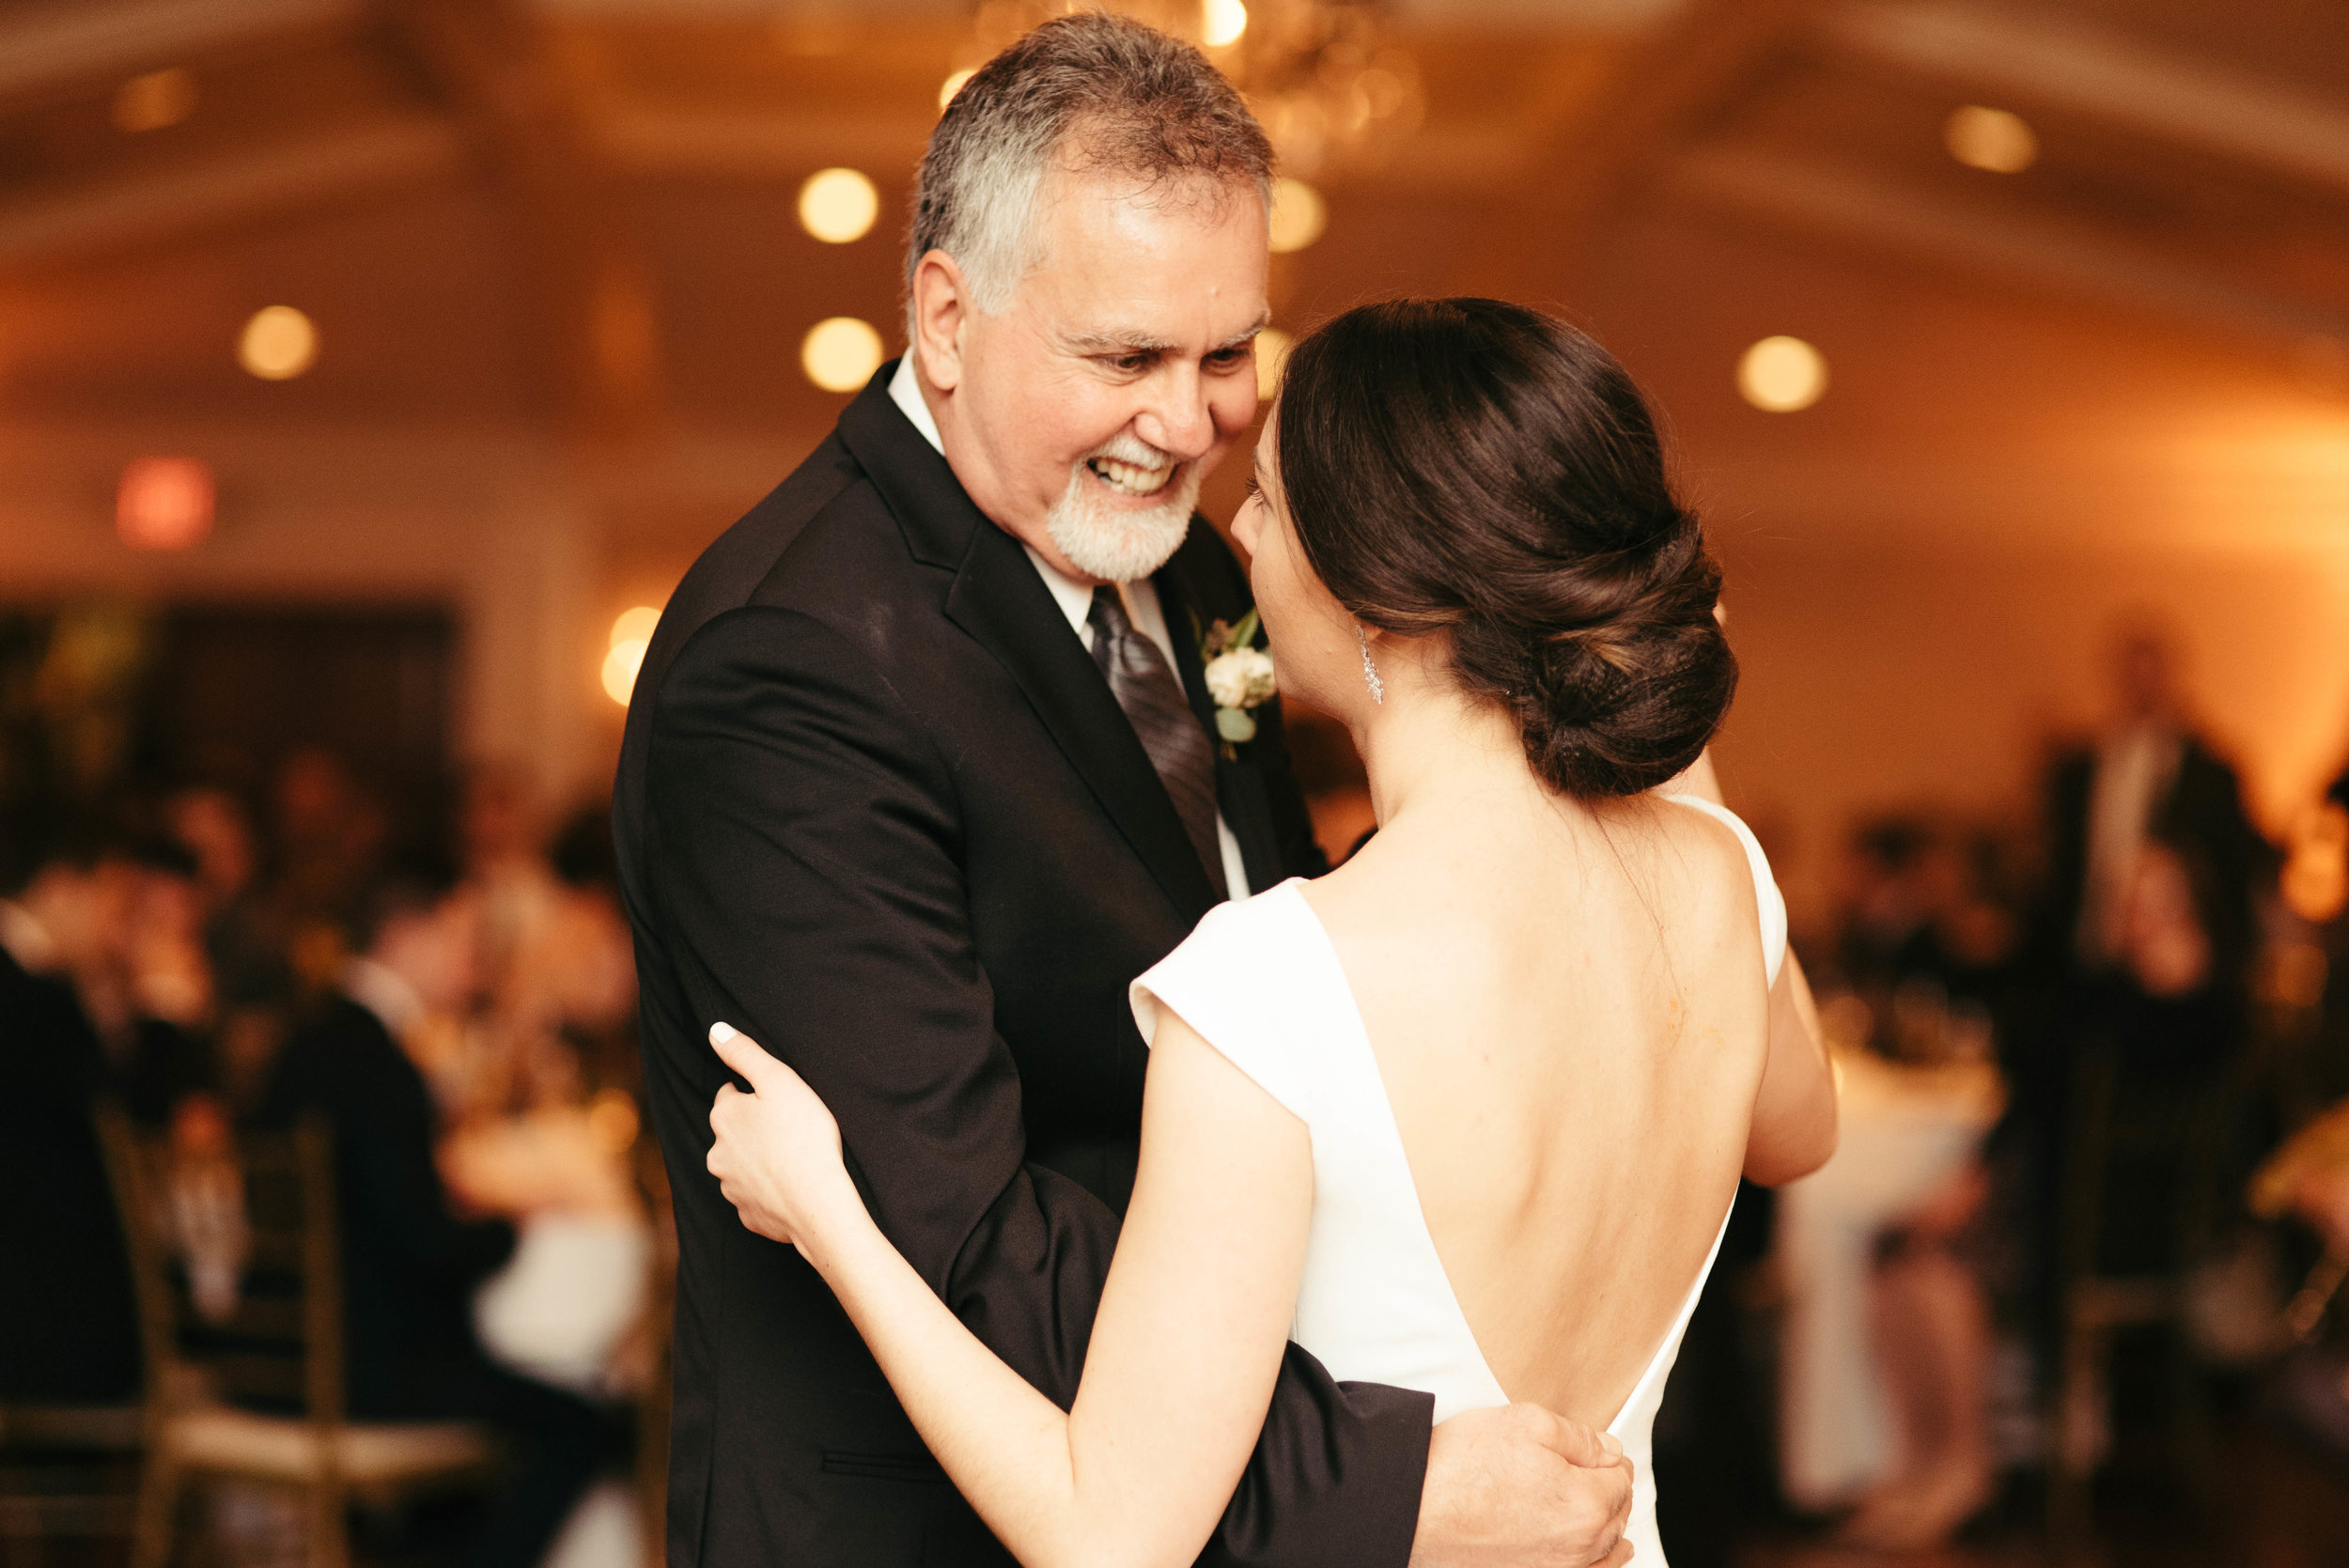 oakmont country club wedding-45.jpg